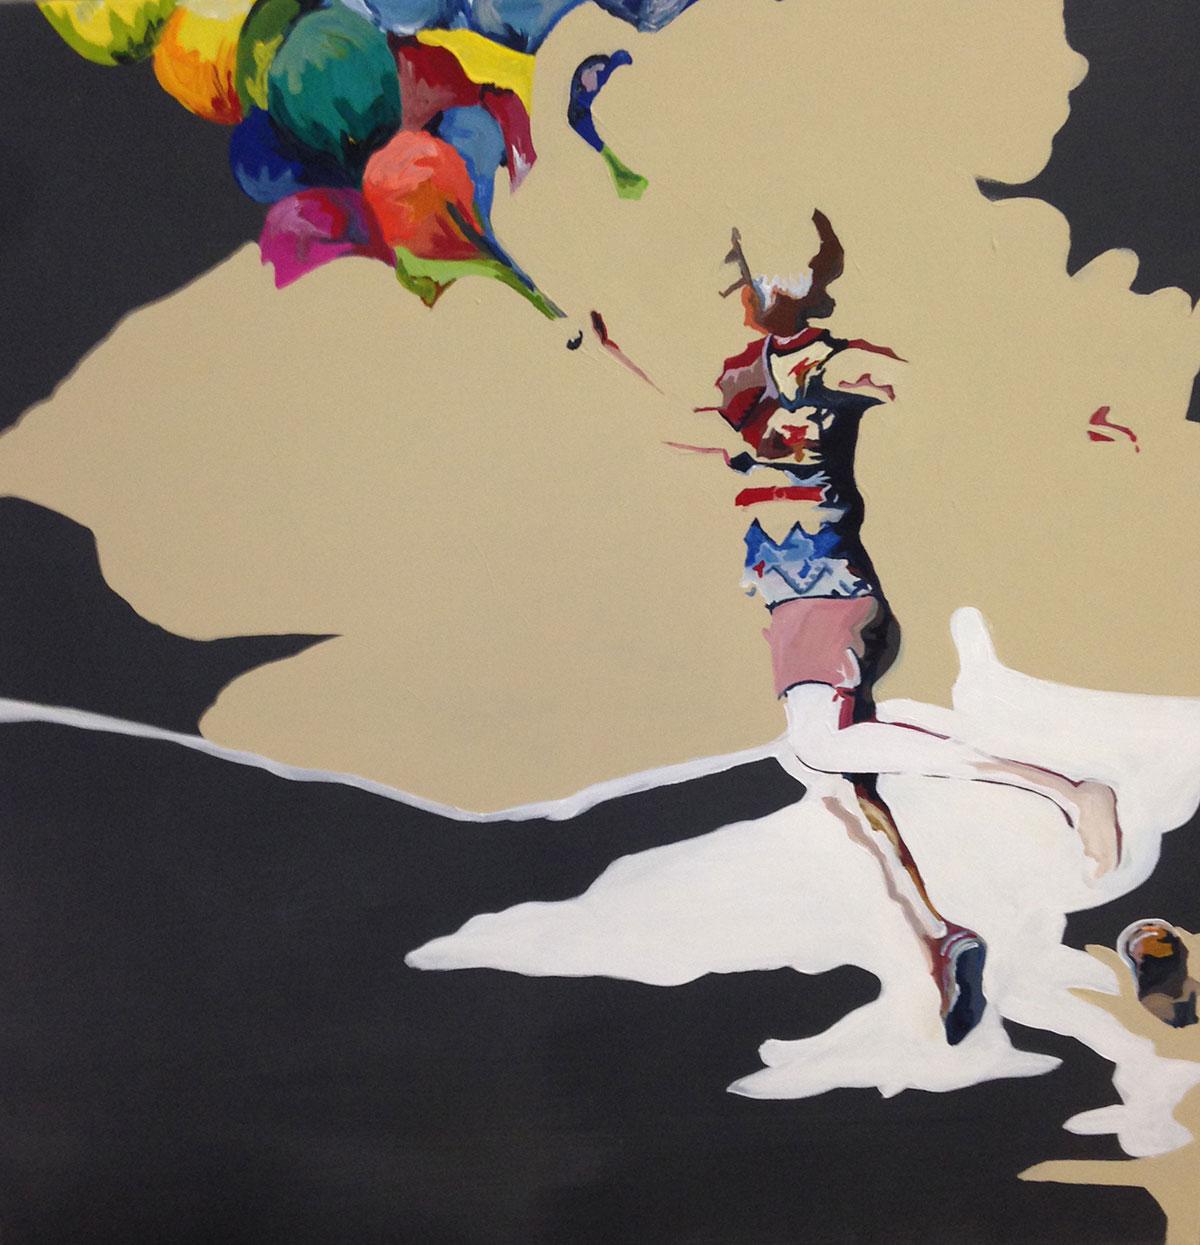 Luftballon.jpg